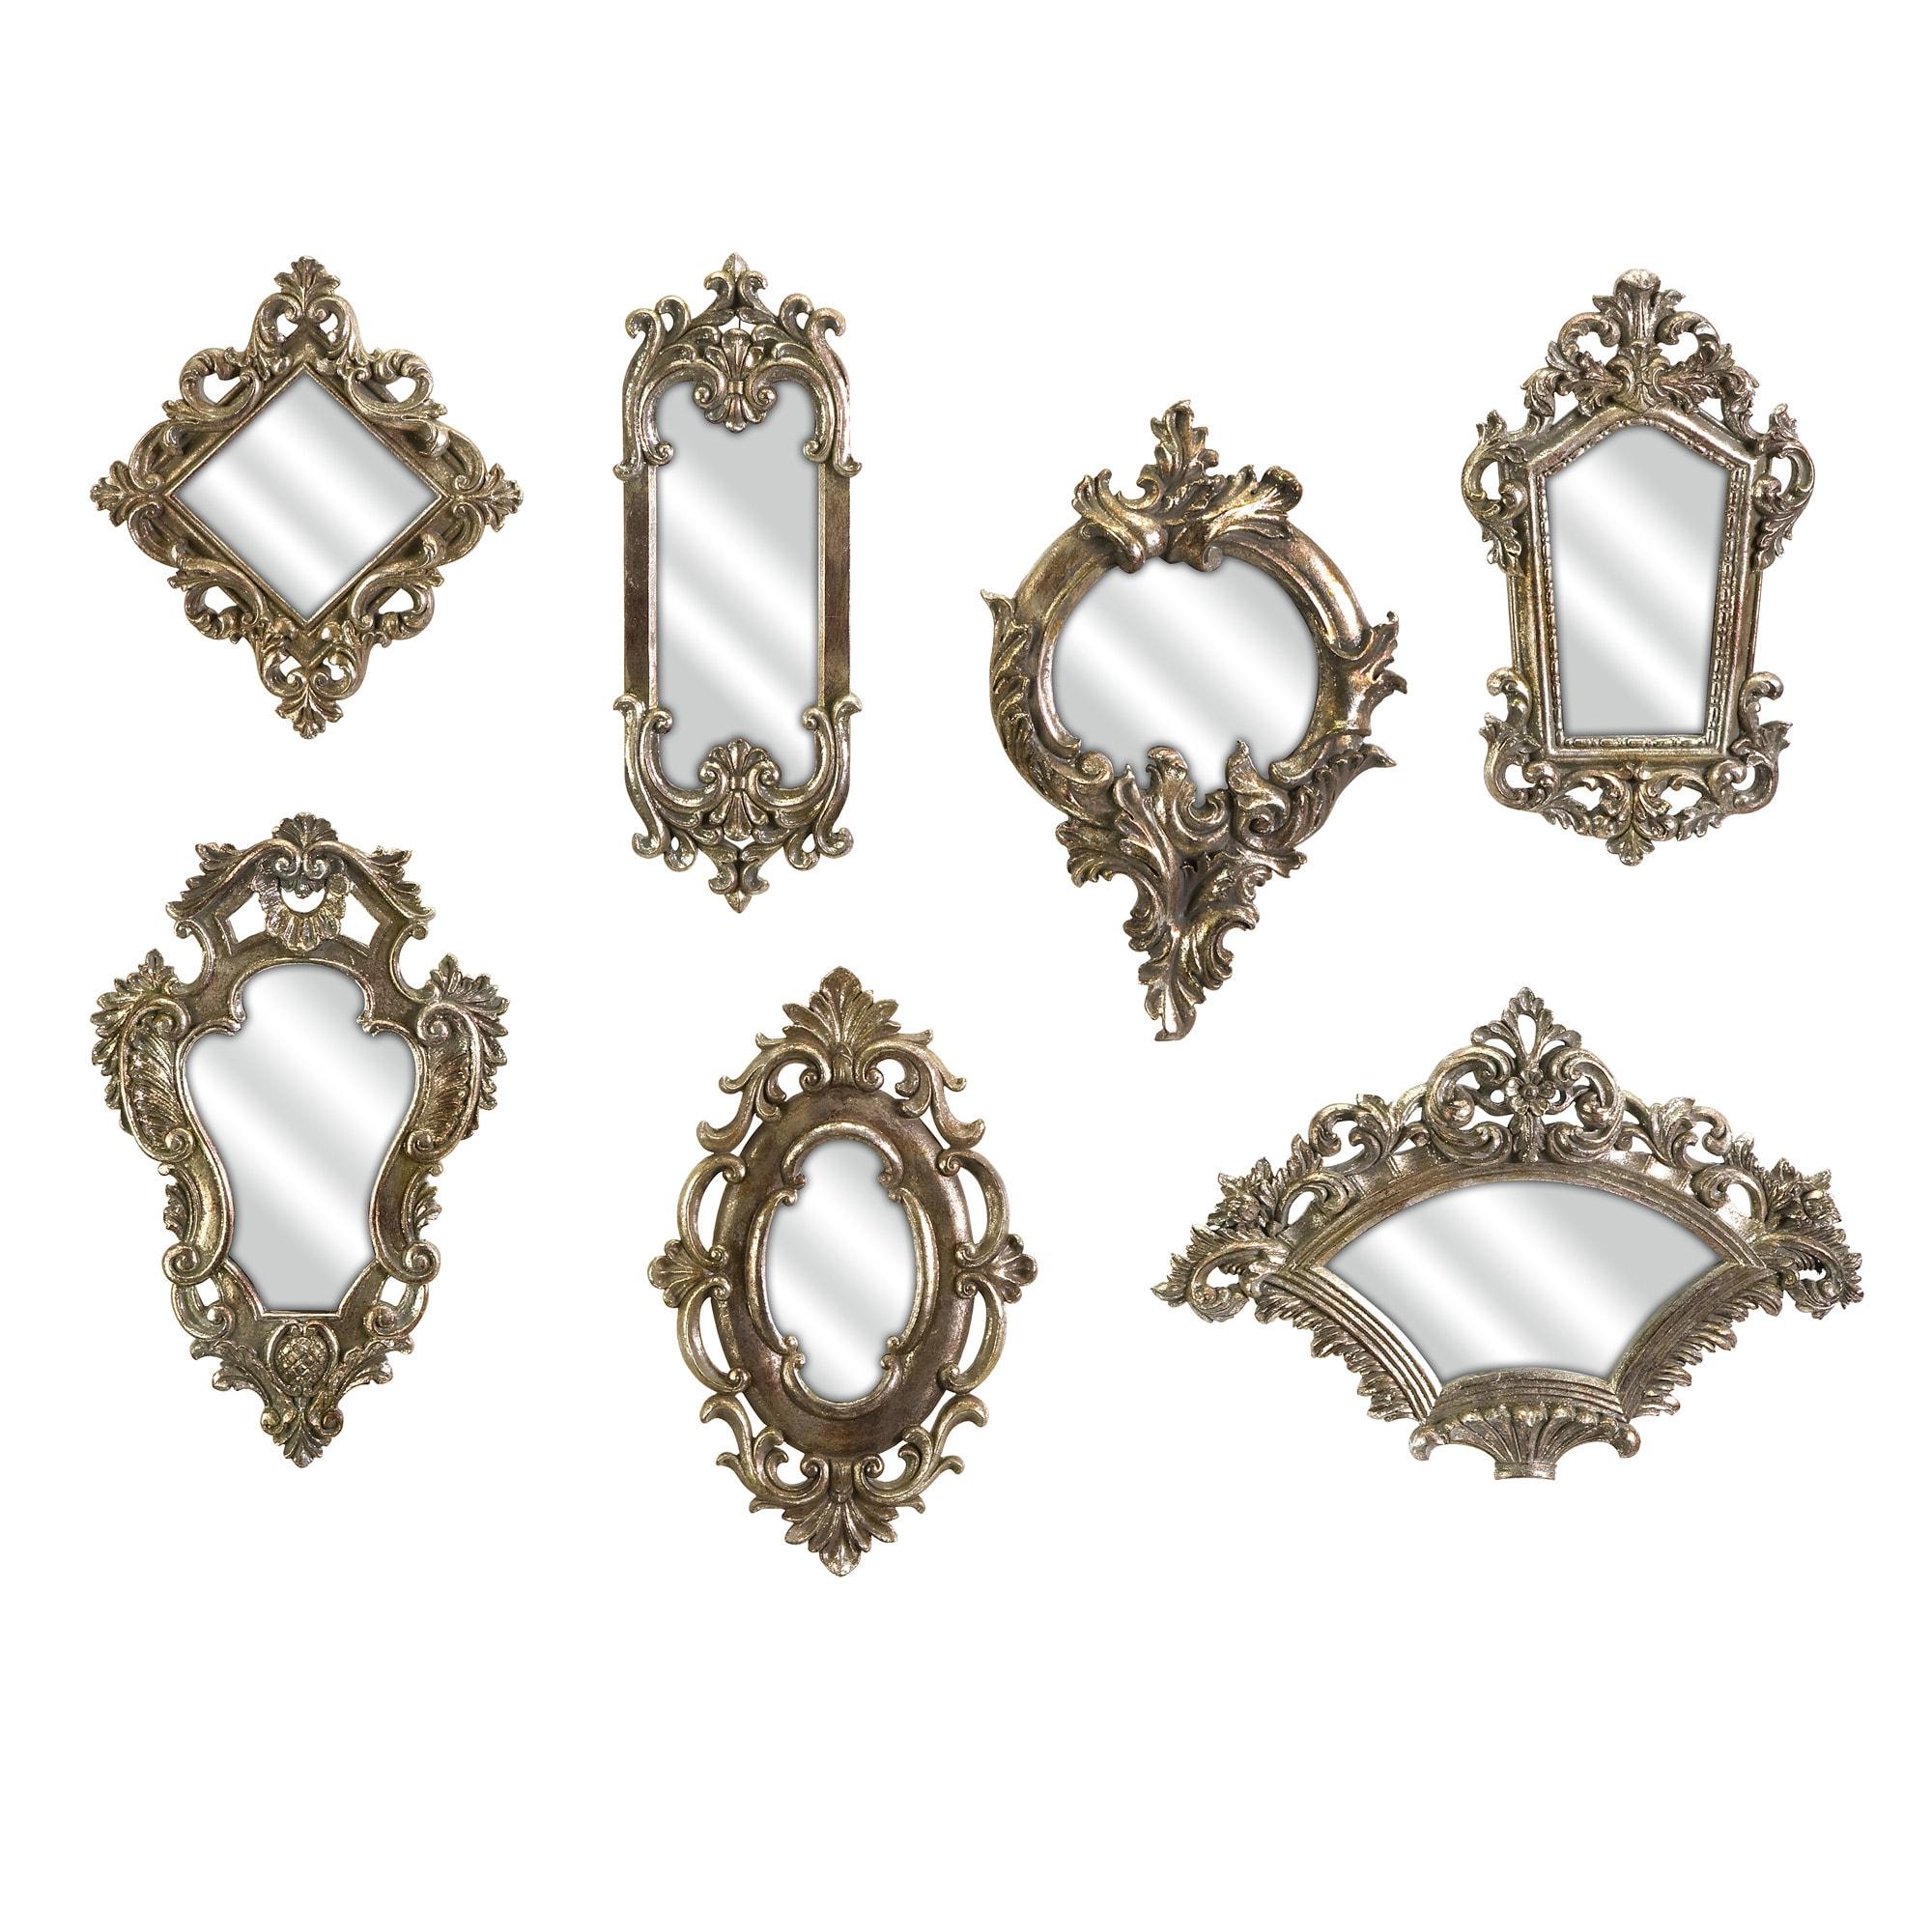 7 Loletta Victorian Inspired Mirrors